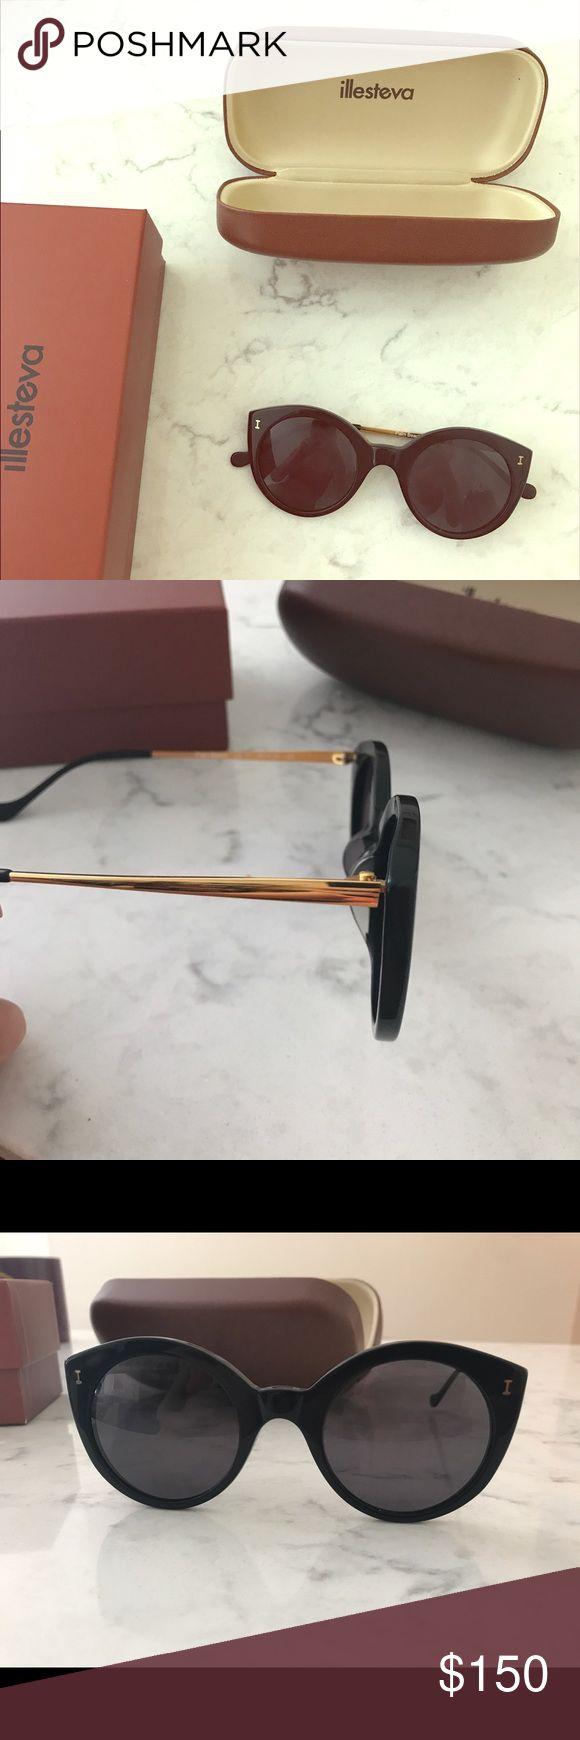 Illesteva sunglasses 2017 Product listing: https://illesteva.com/palm-beach, worn a few times, no damage. Black and gold frames. Polarized. Illesteva Accessories Sunglasses